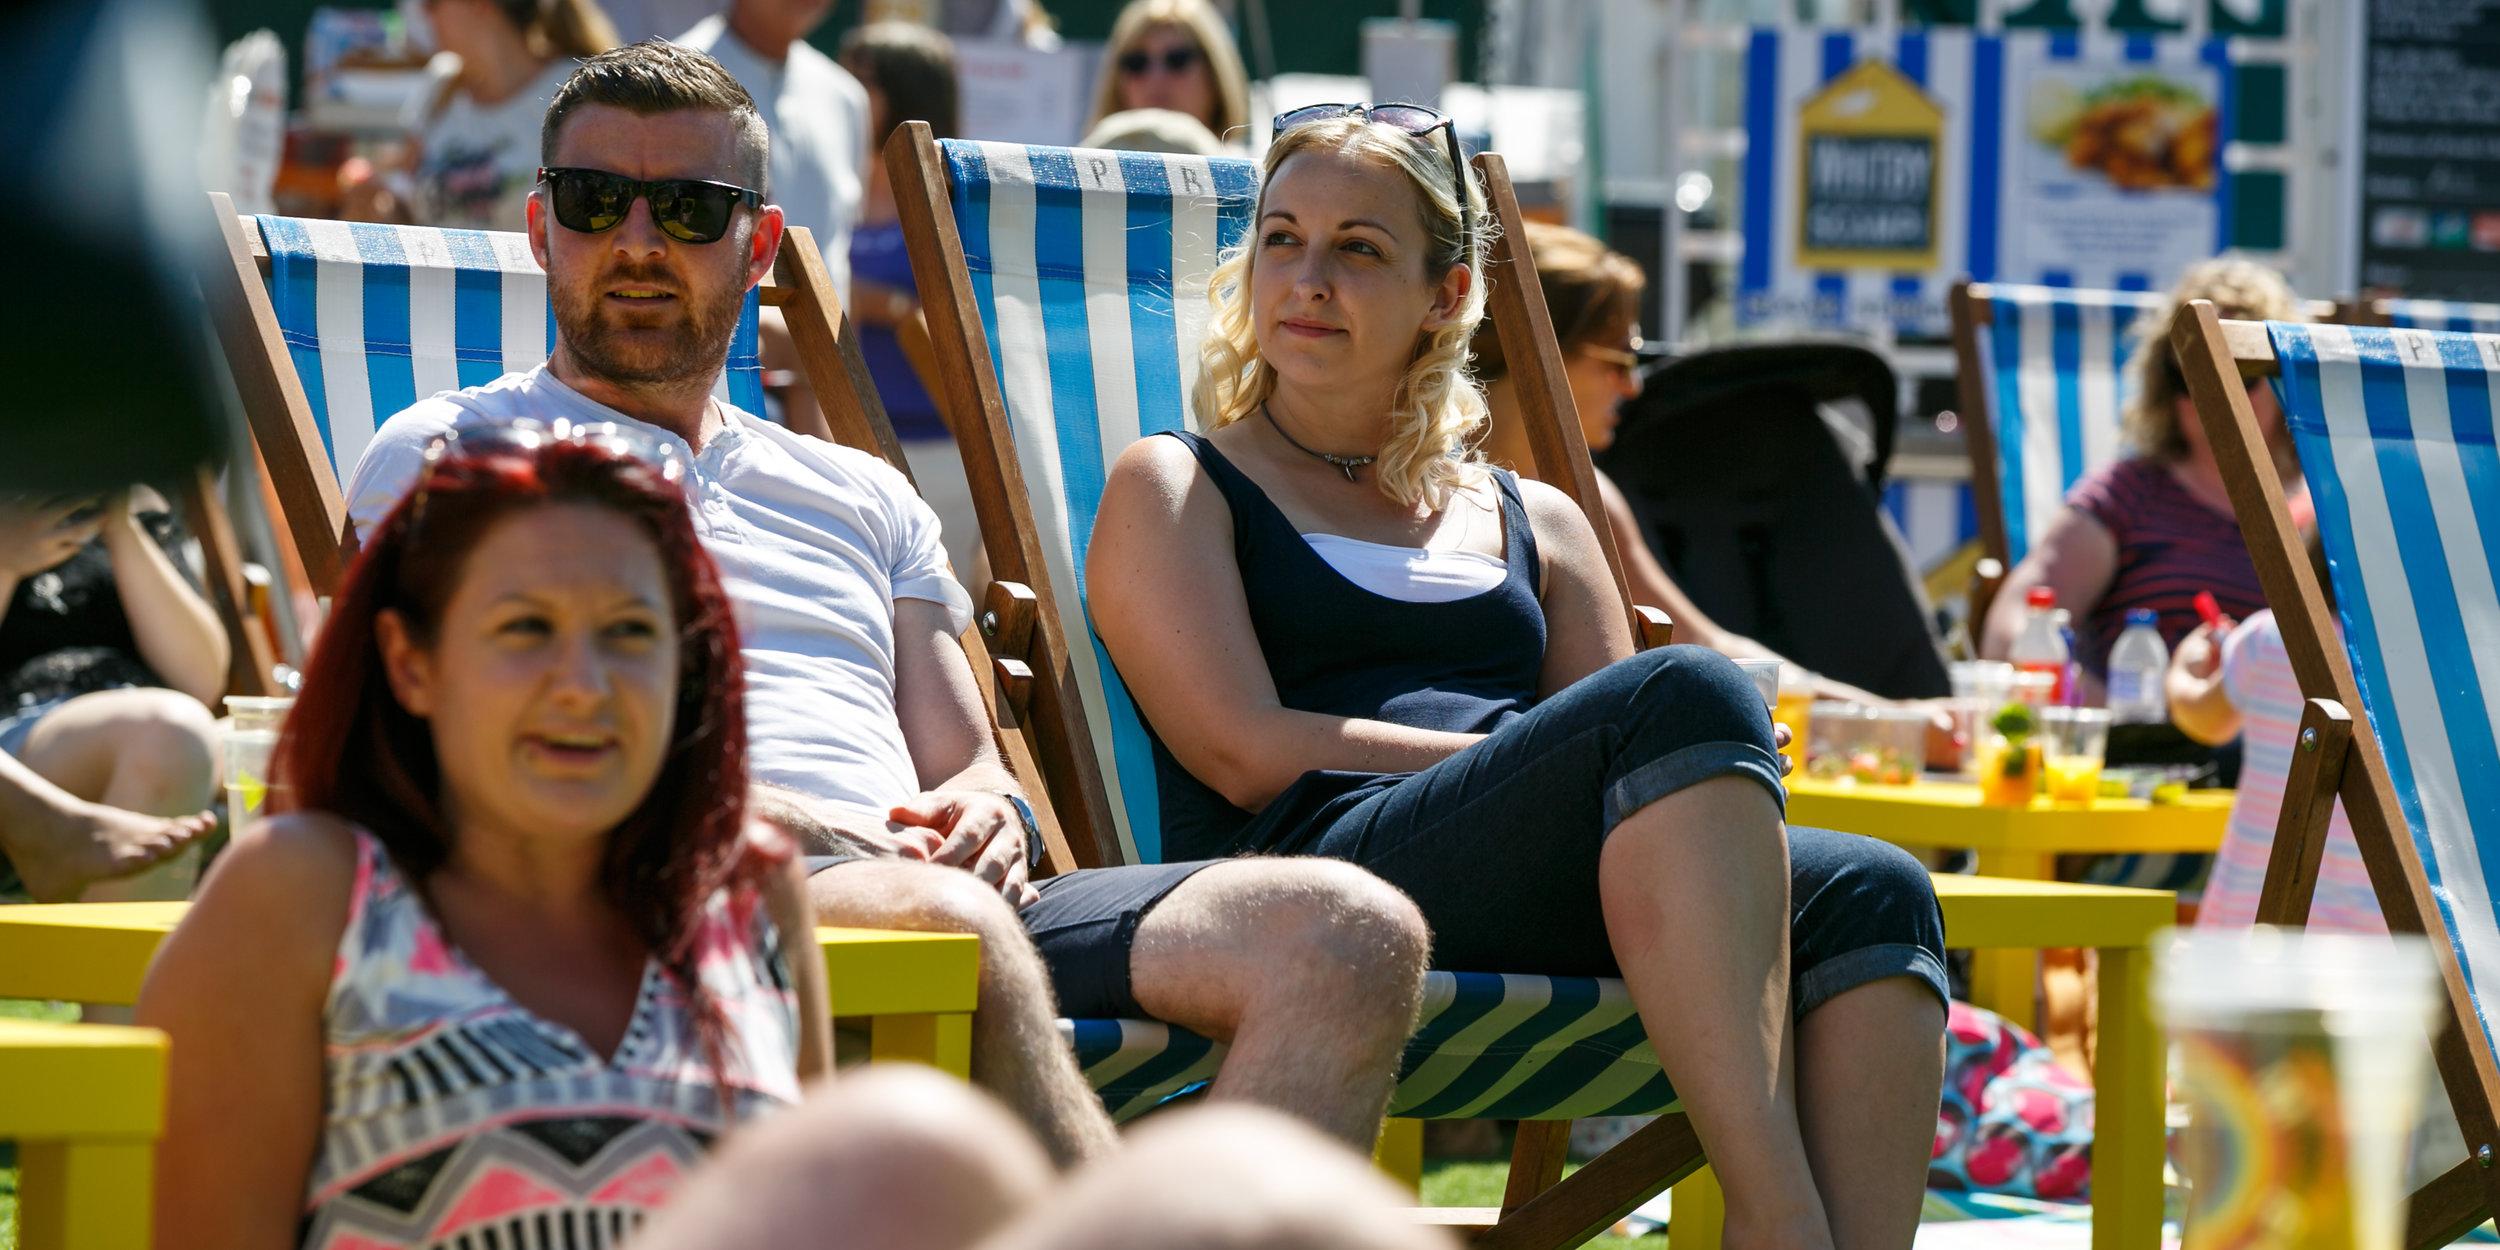 Gloucester Quays Food Festival